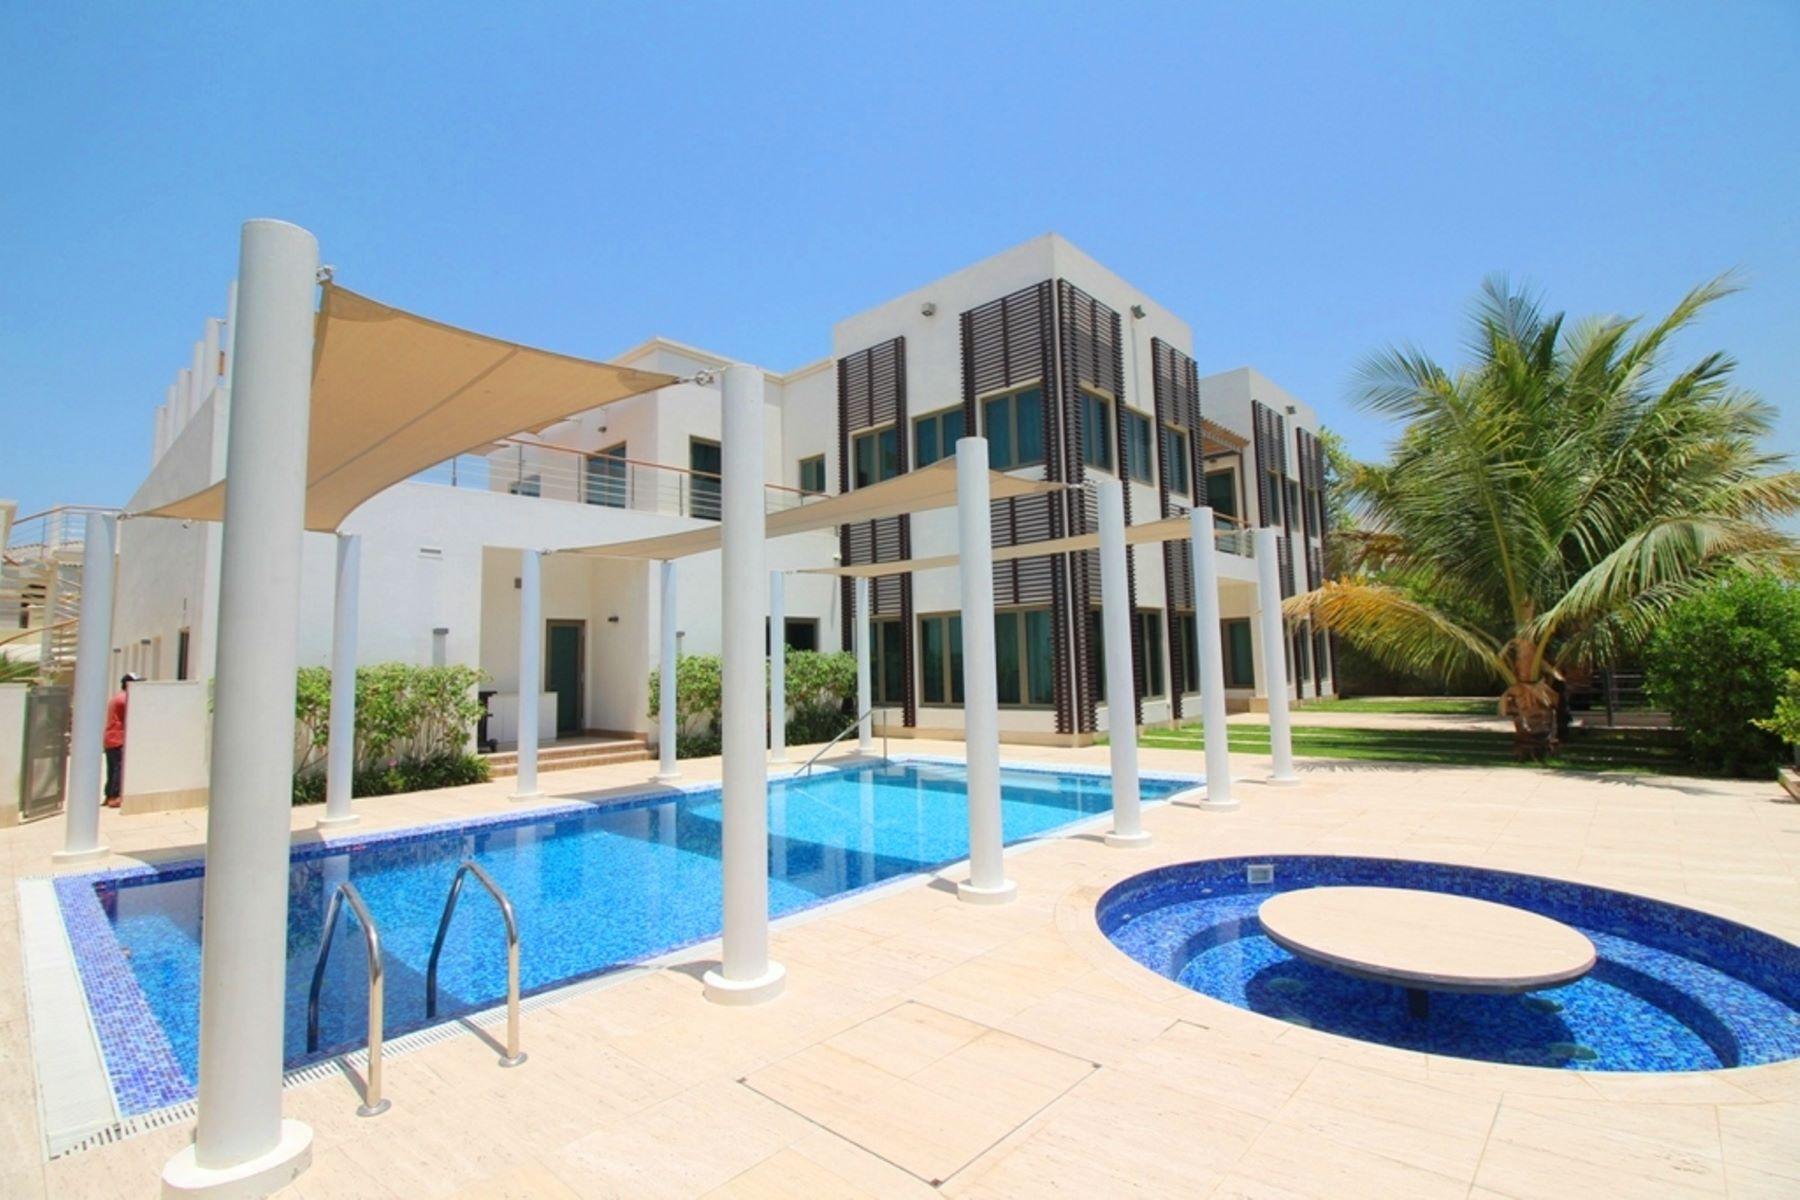 Single Family Homes for Sale at Renovated Villa facing Luxury Yachts Other Dubai, Dubai United Arab Emirates